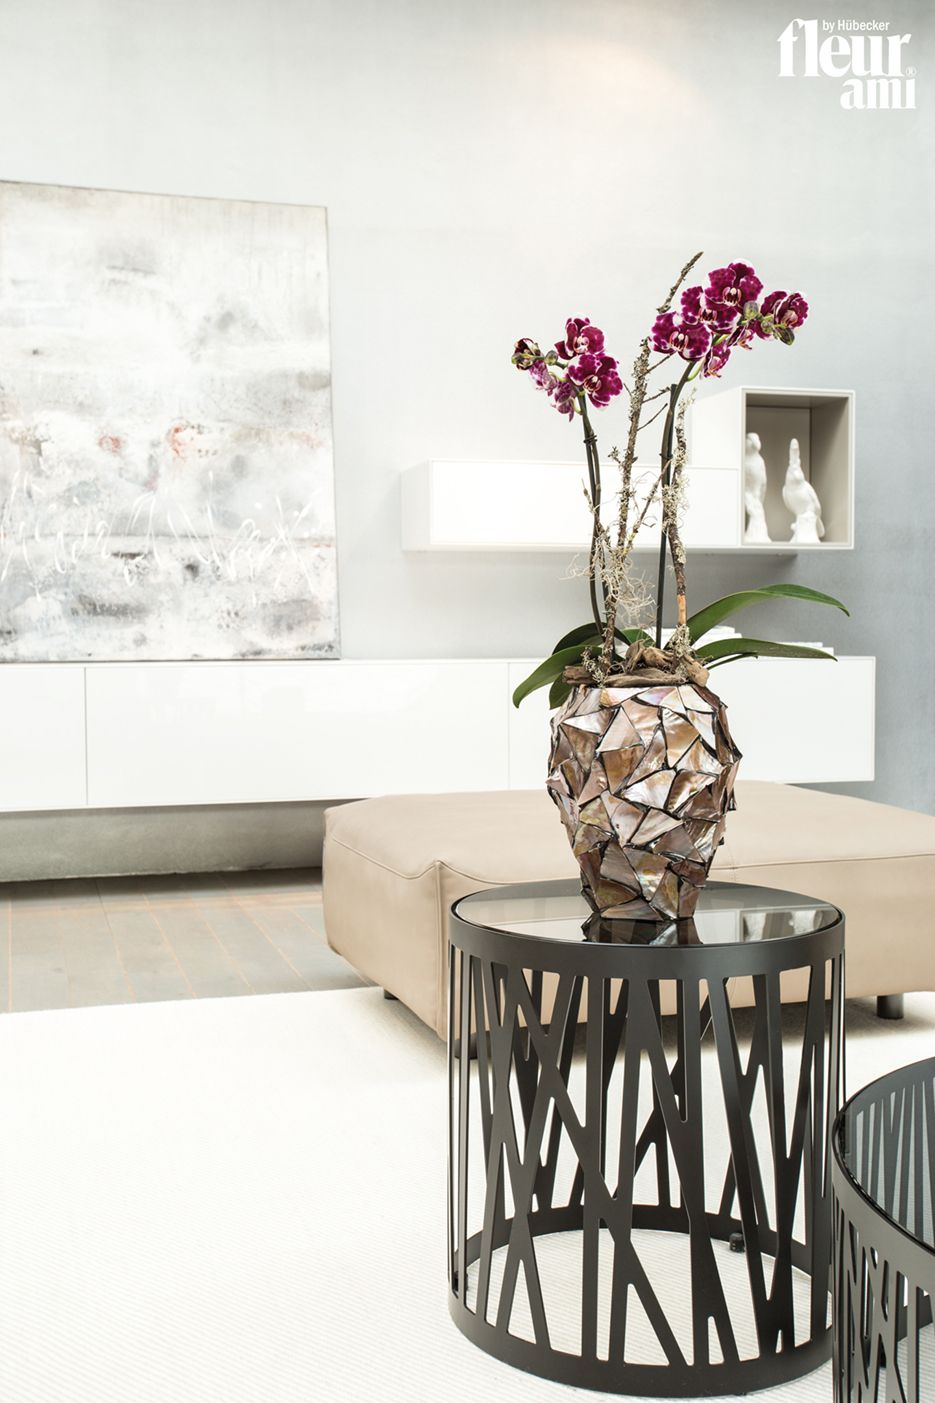 Fleur Ami shell orchid vase by fleur ami muschel orchideen topf fleur